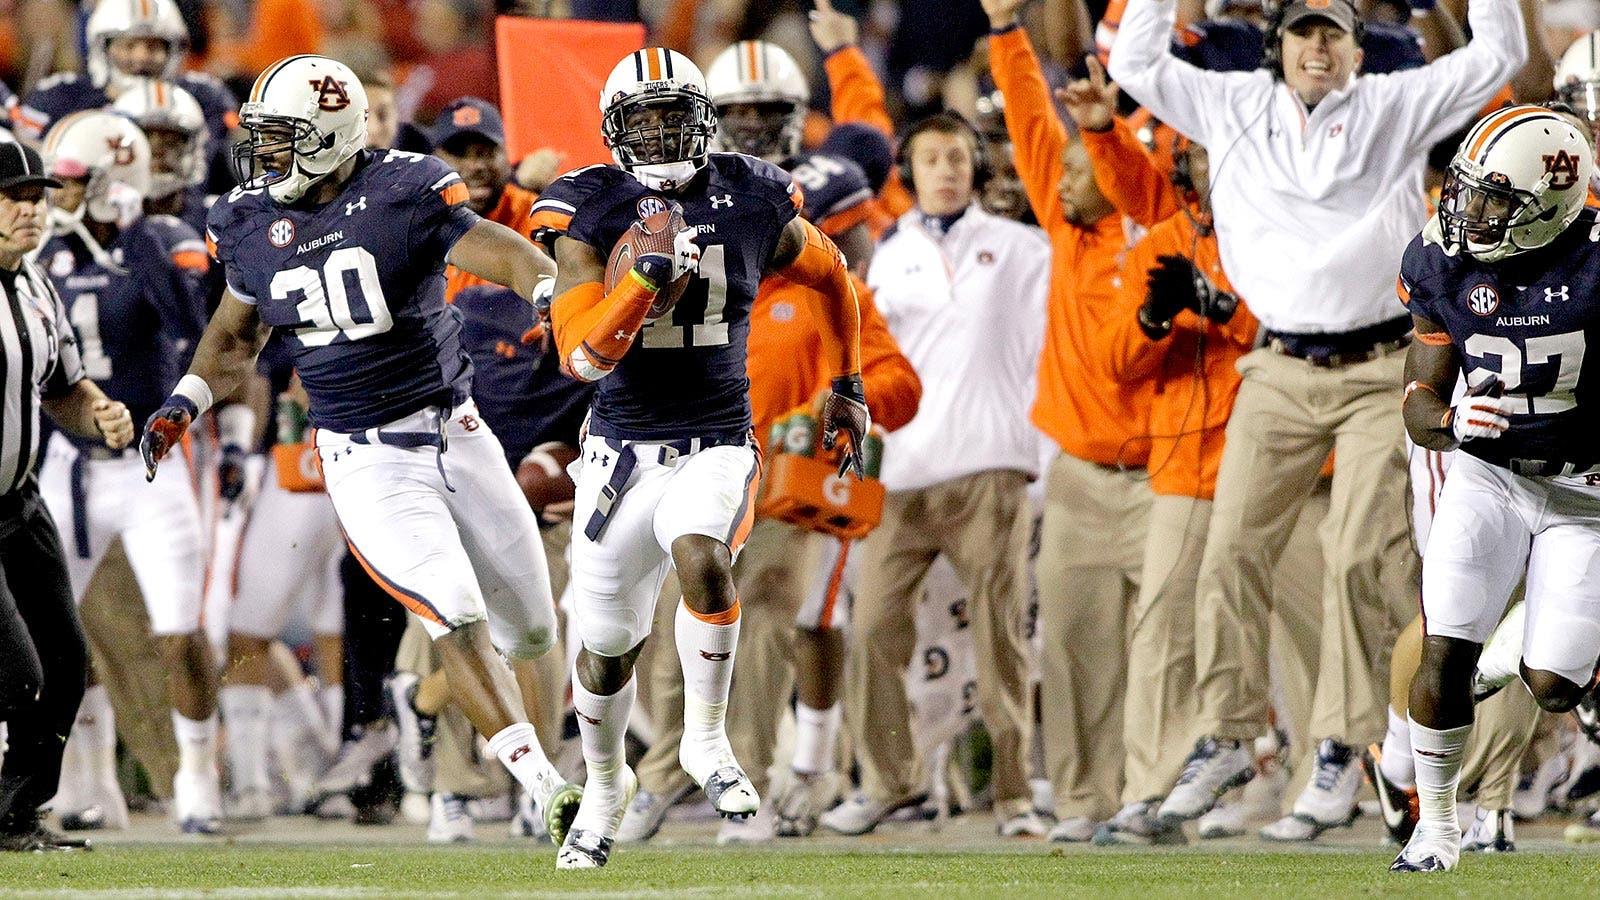 Auburn shocks Alabama with game-winning missed field goal return TD